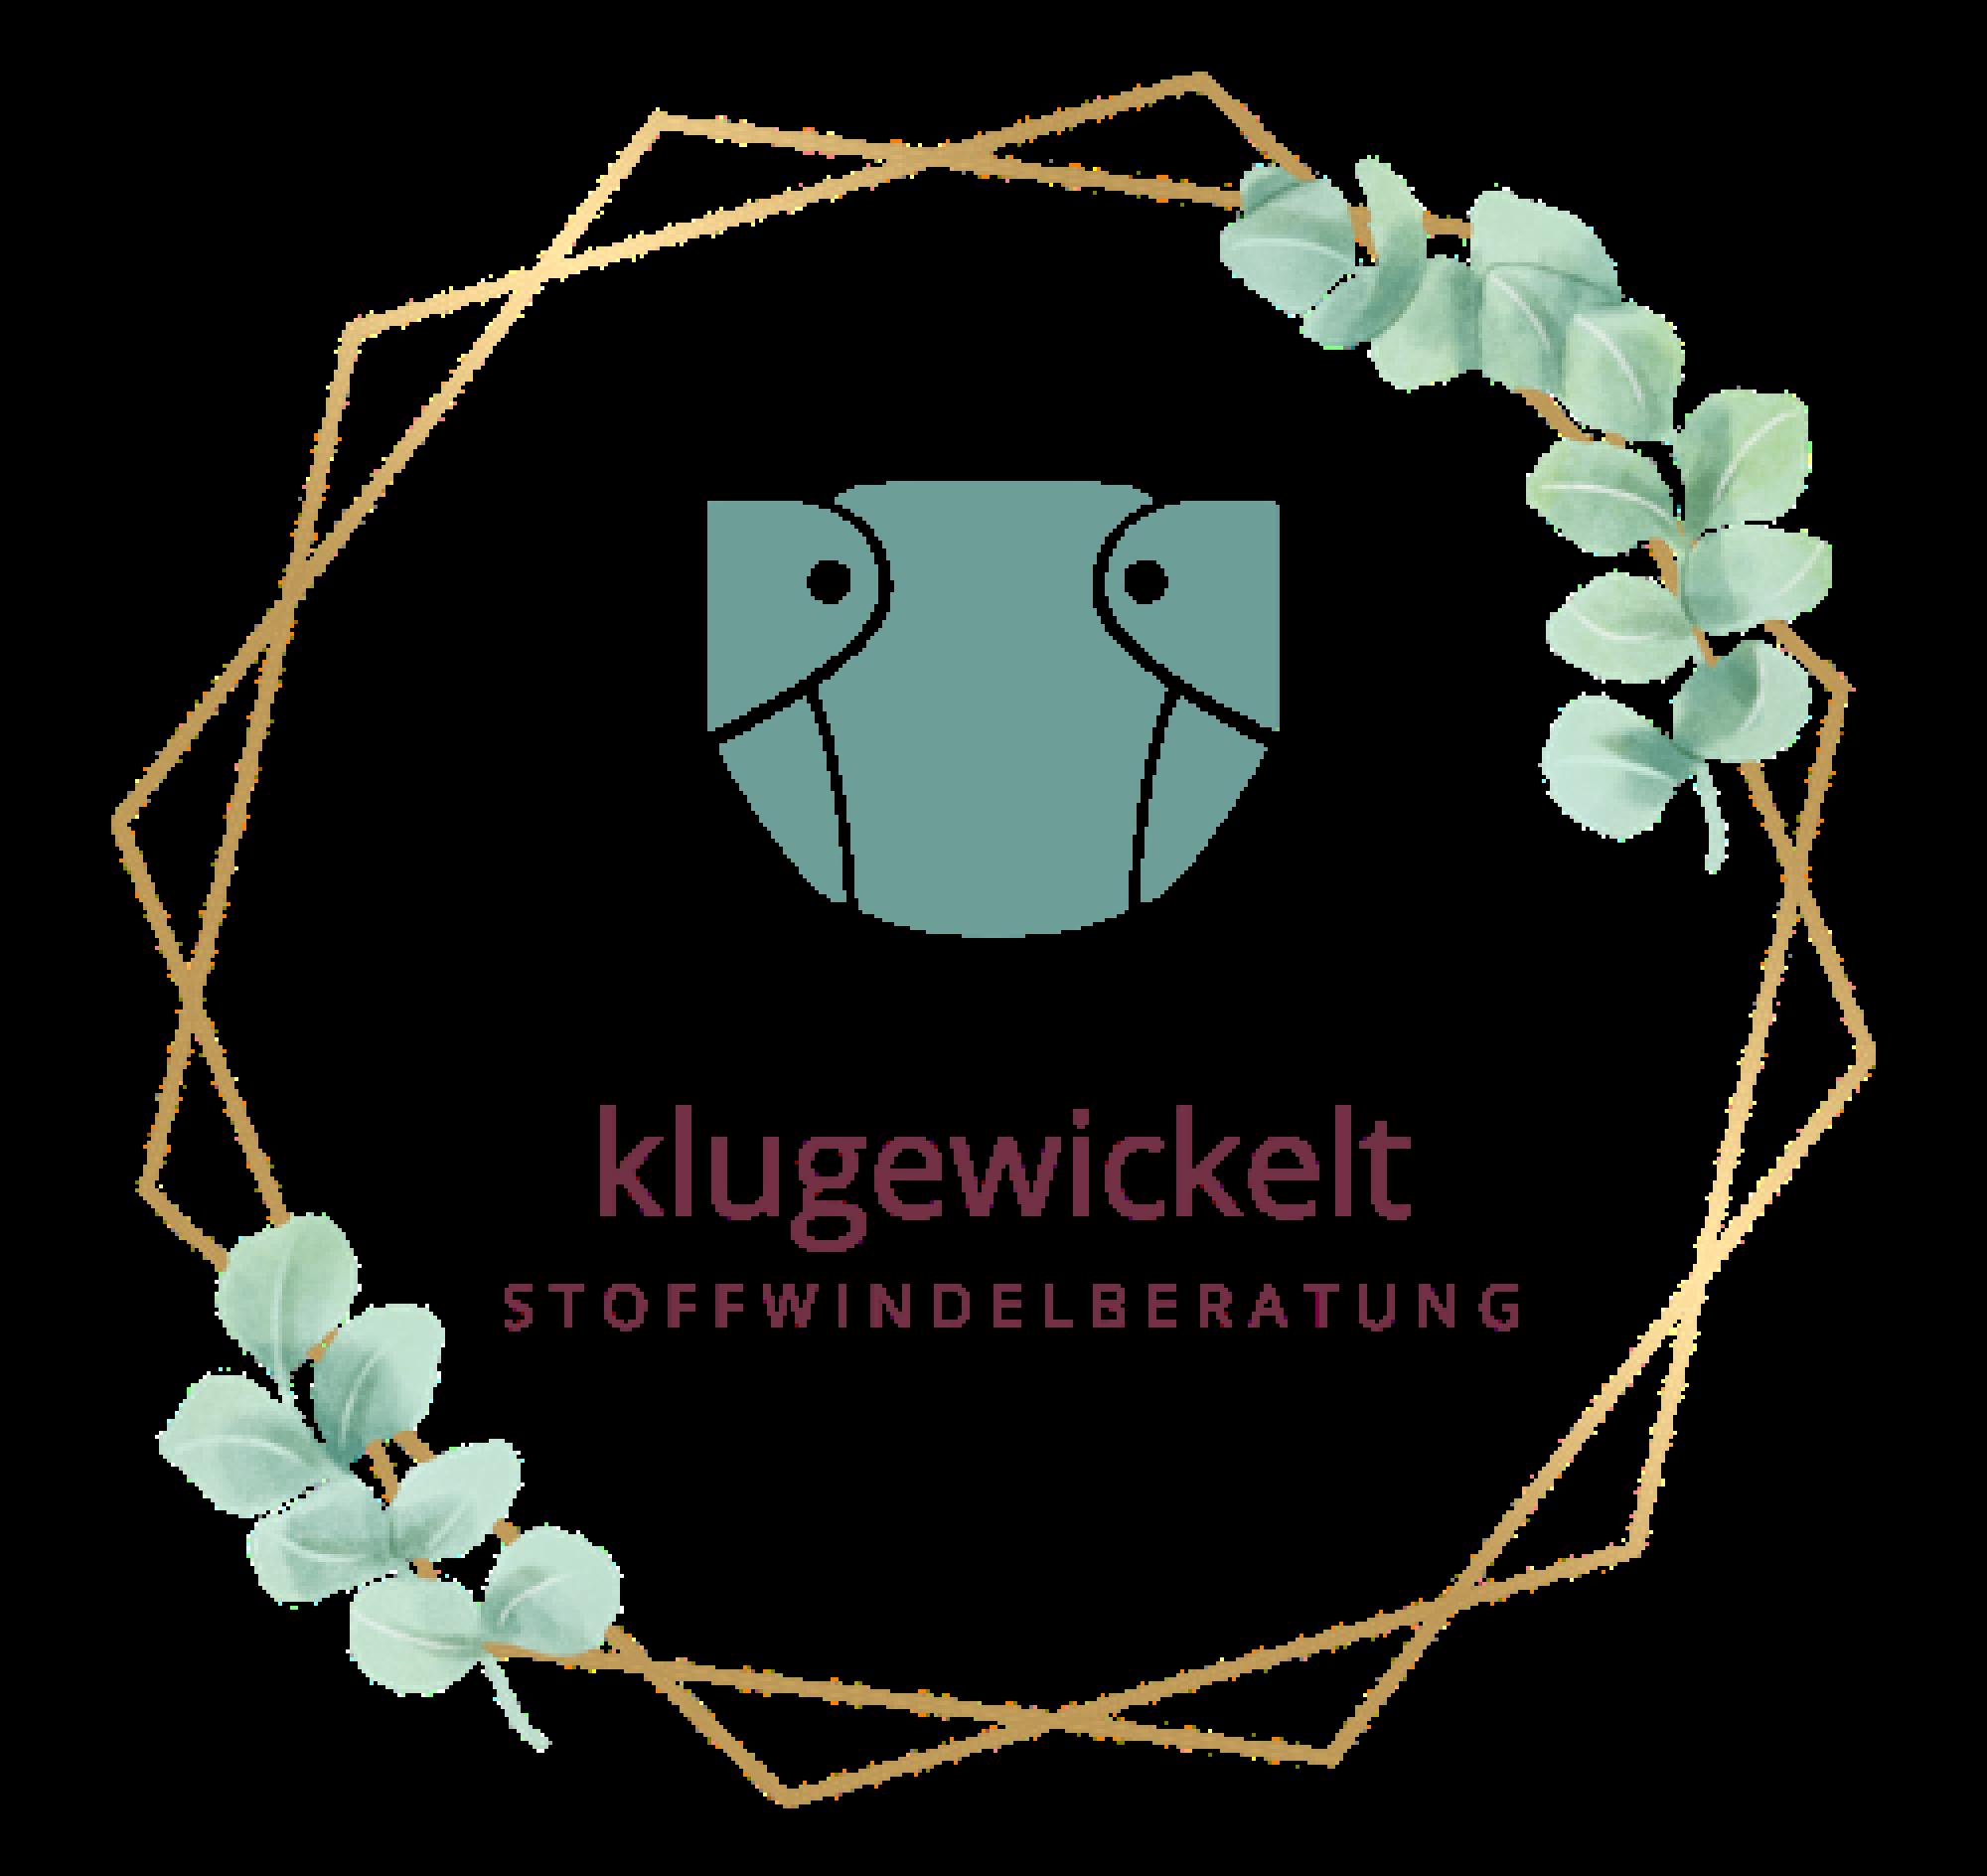 Stoffwindelberatung Kristin Kluge